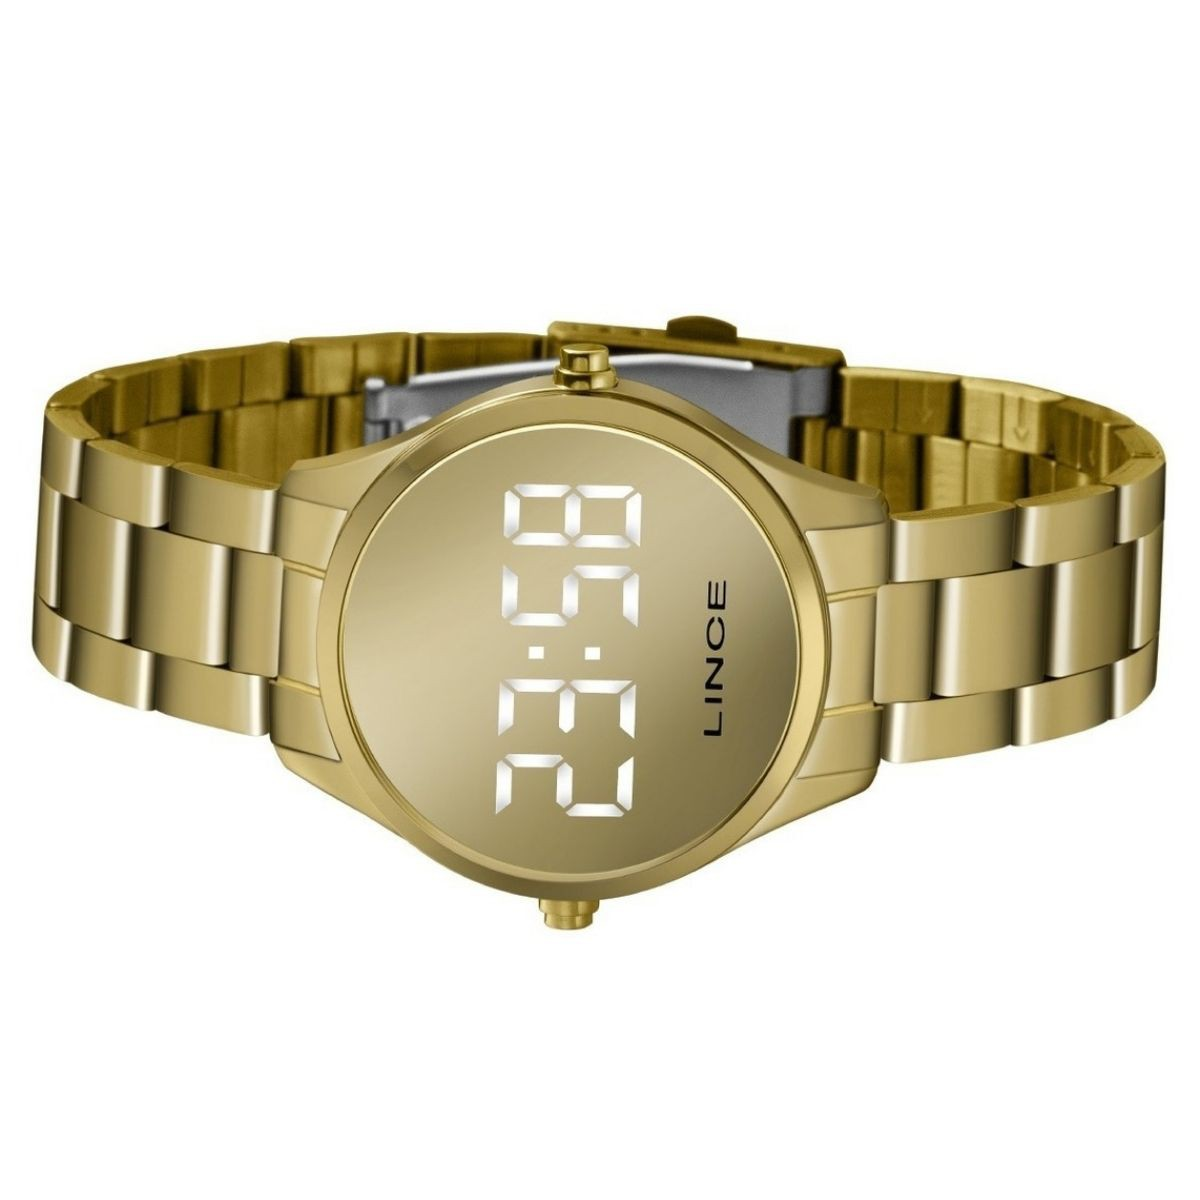 Relógio Feminino Lince Dourado MDG4617L